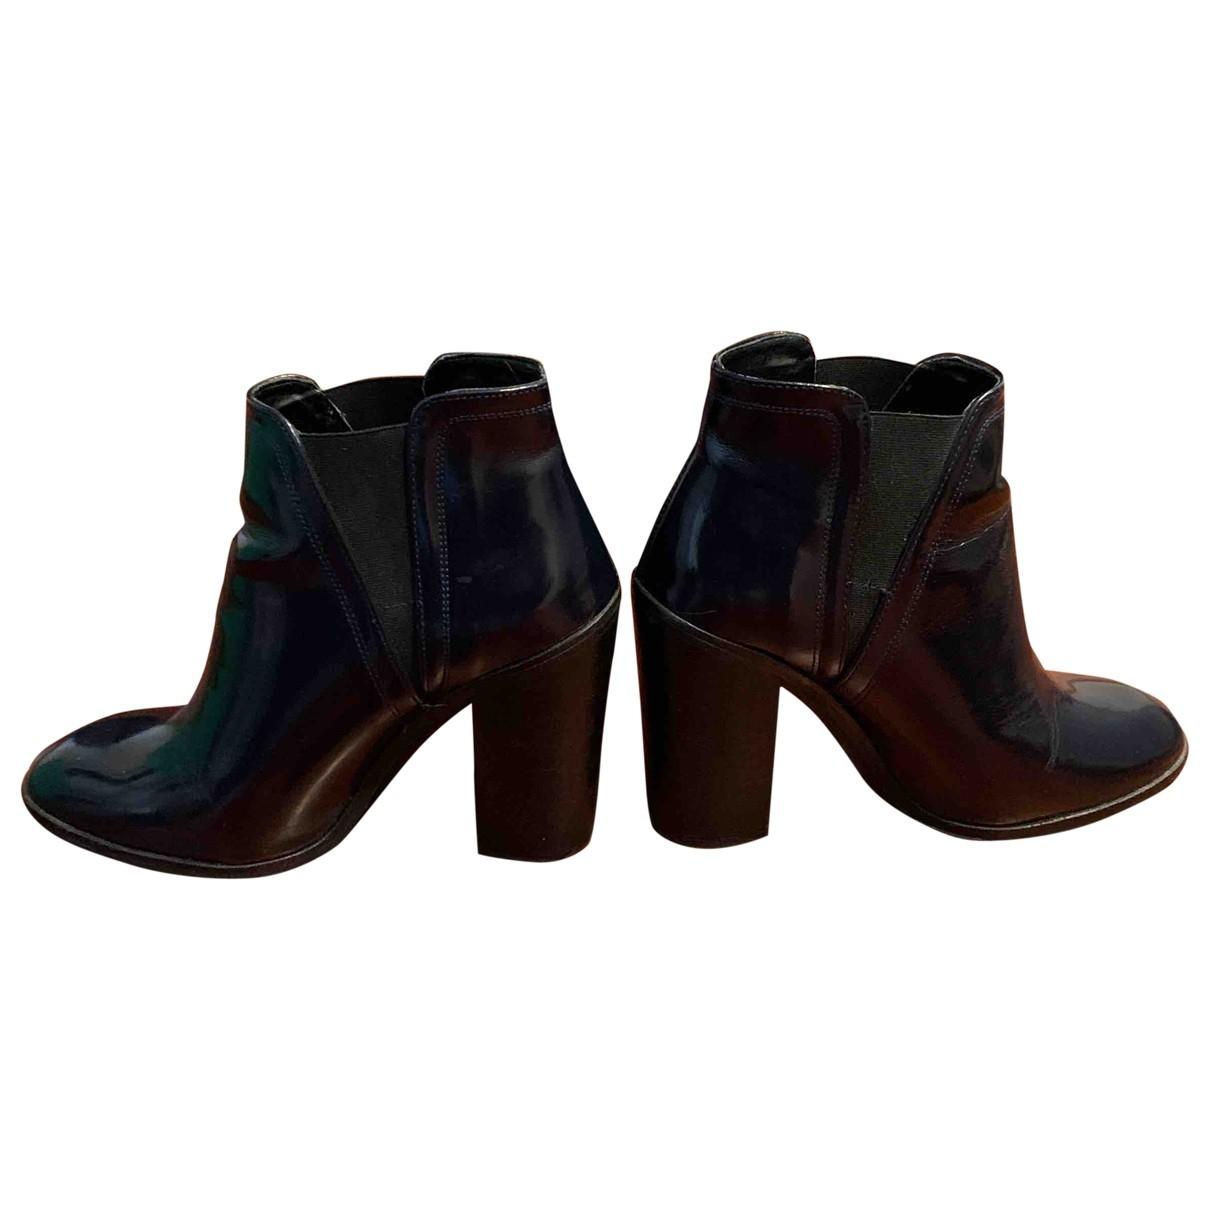 Zara - Boots   pour femme en cuir verni - bleu